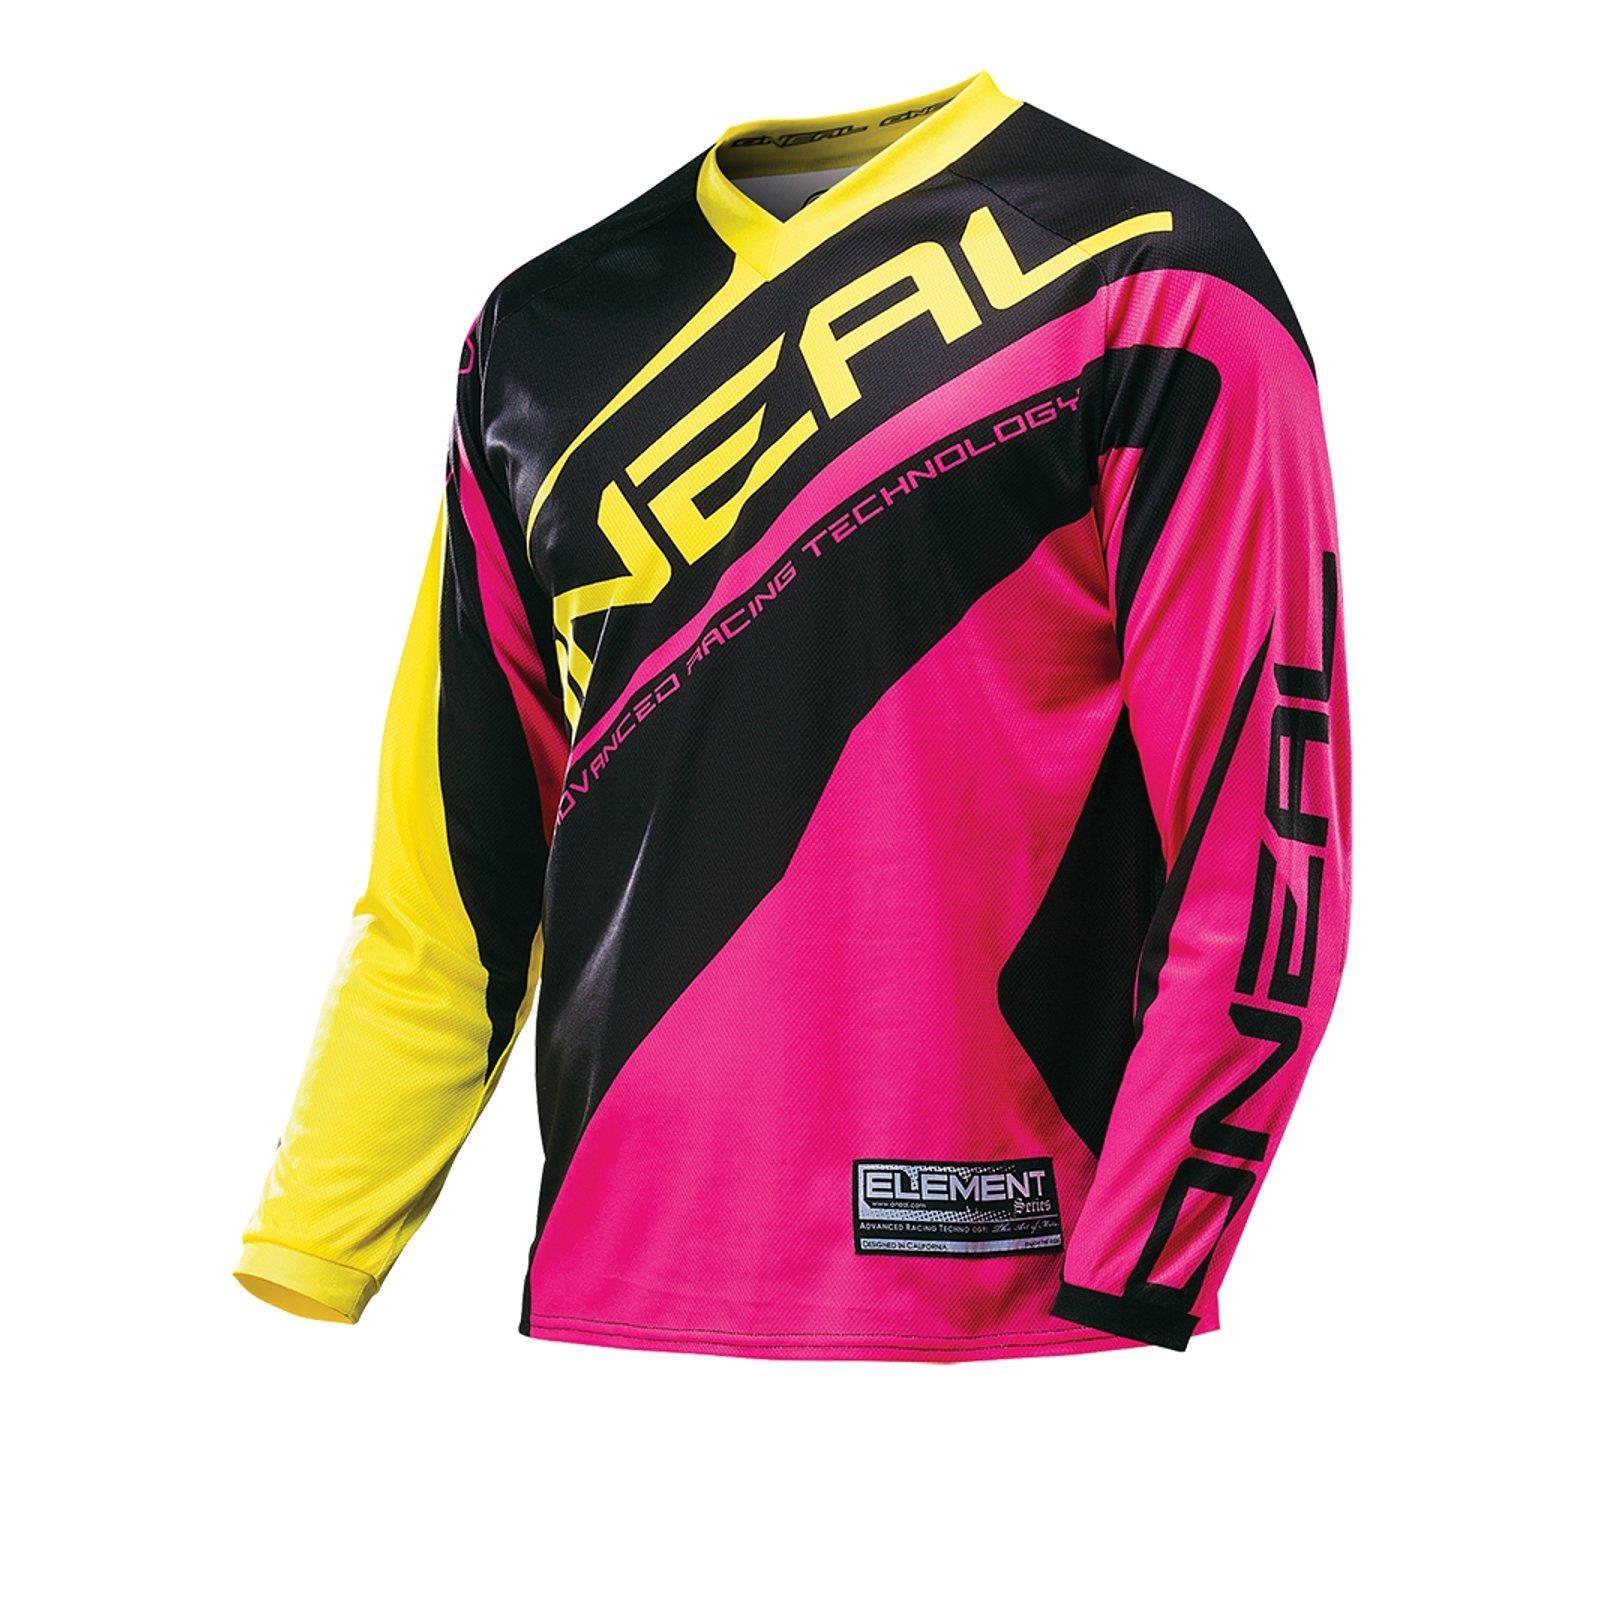 O-039-Neal-elemento-Mayhem-JERSEY-Racewear-Motocross-Maglia-MX-DH-FR-MTB-MOUNTAIN-BIKE miniatura 101